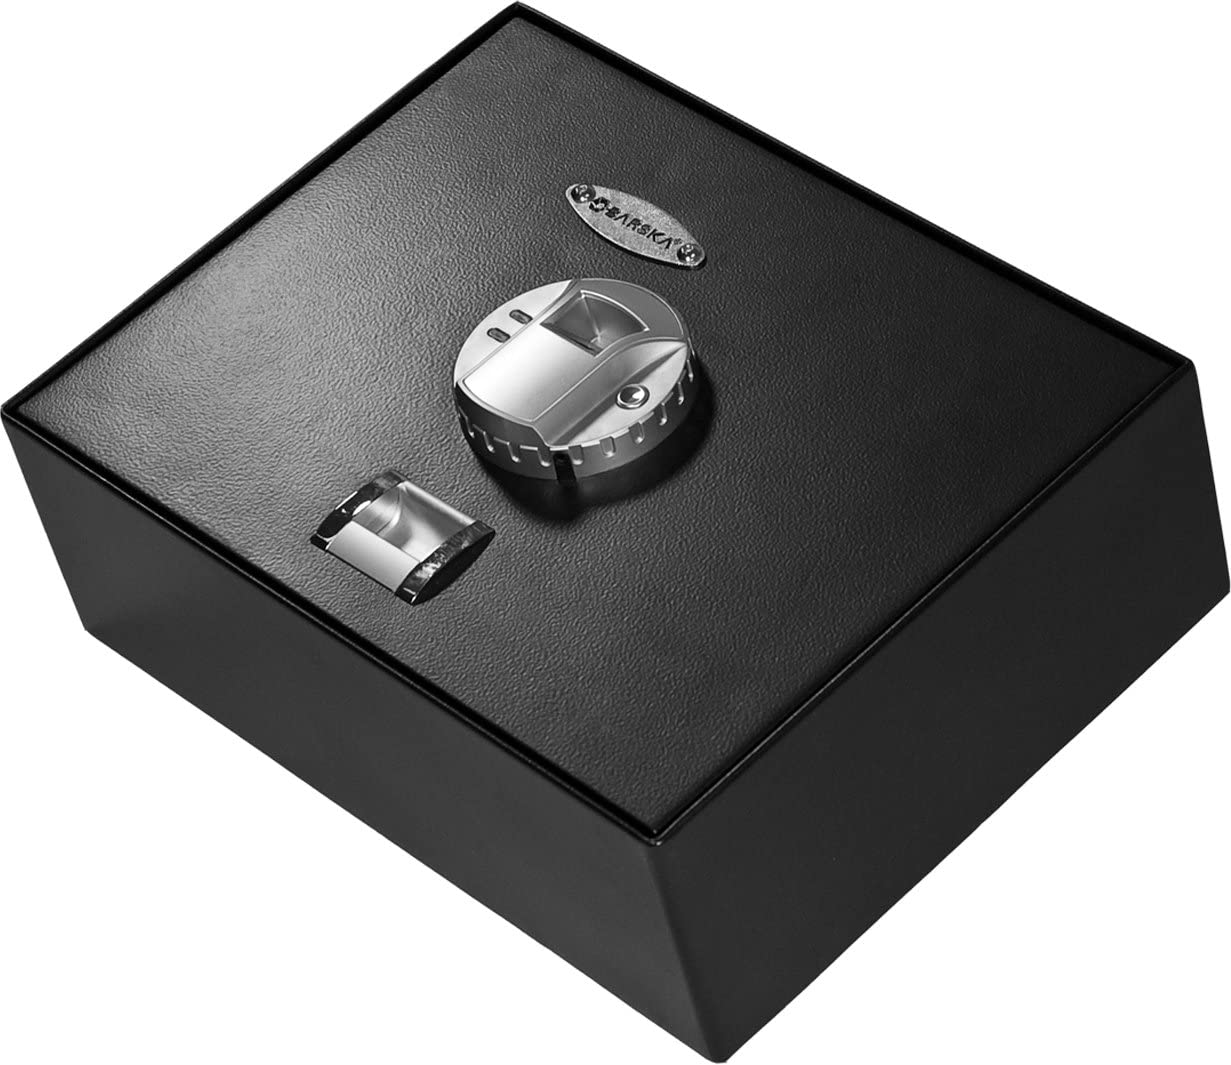 BARSKA AX11556 Biometric Fingerprint Top Opening Security Drawer Safe Box 0.23 Cubic Ft 71fHu34VEQLSL1231_